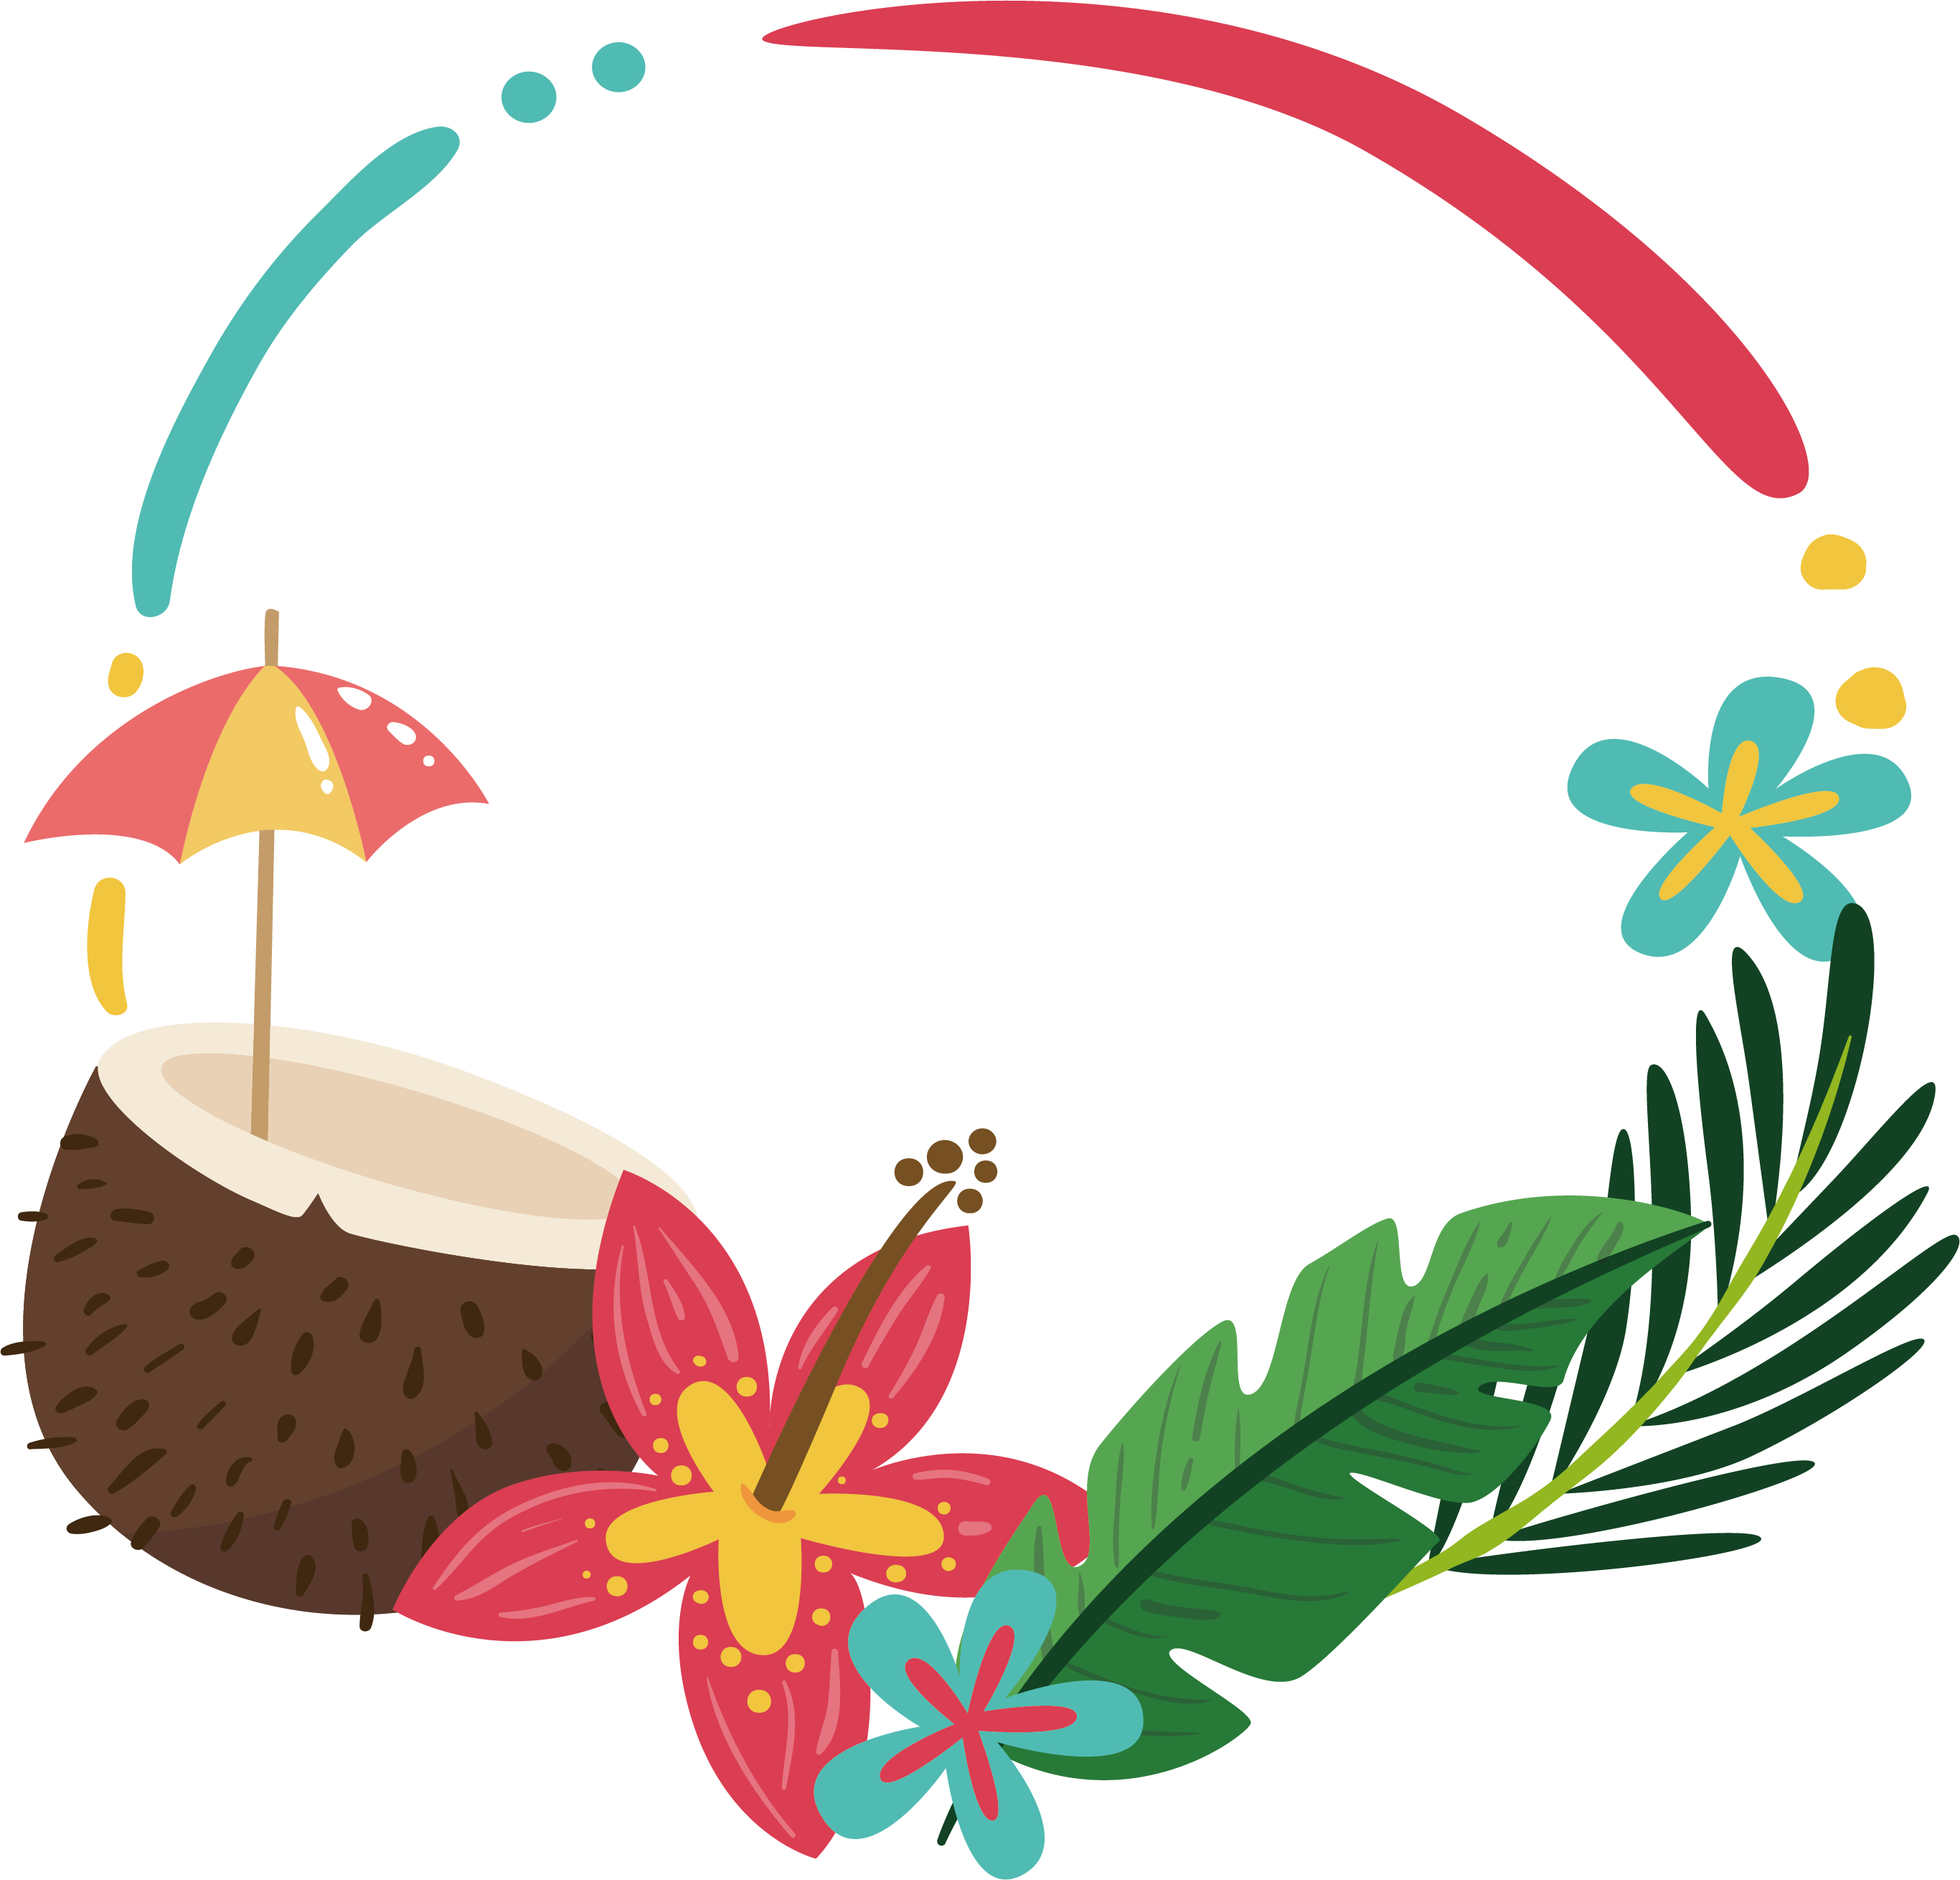 Peppers clipart border. Clip art coconut palm